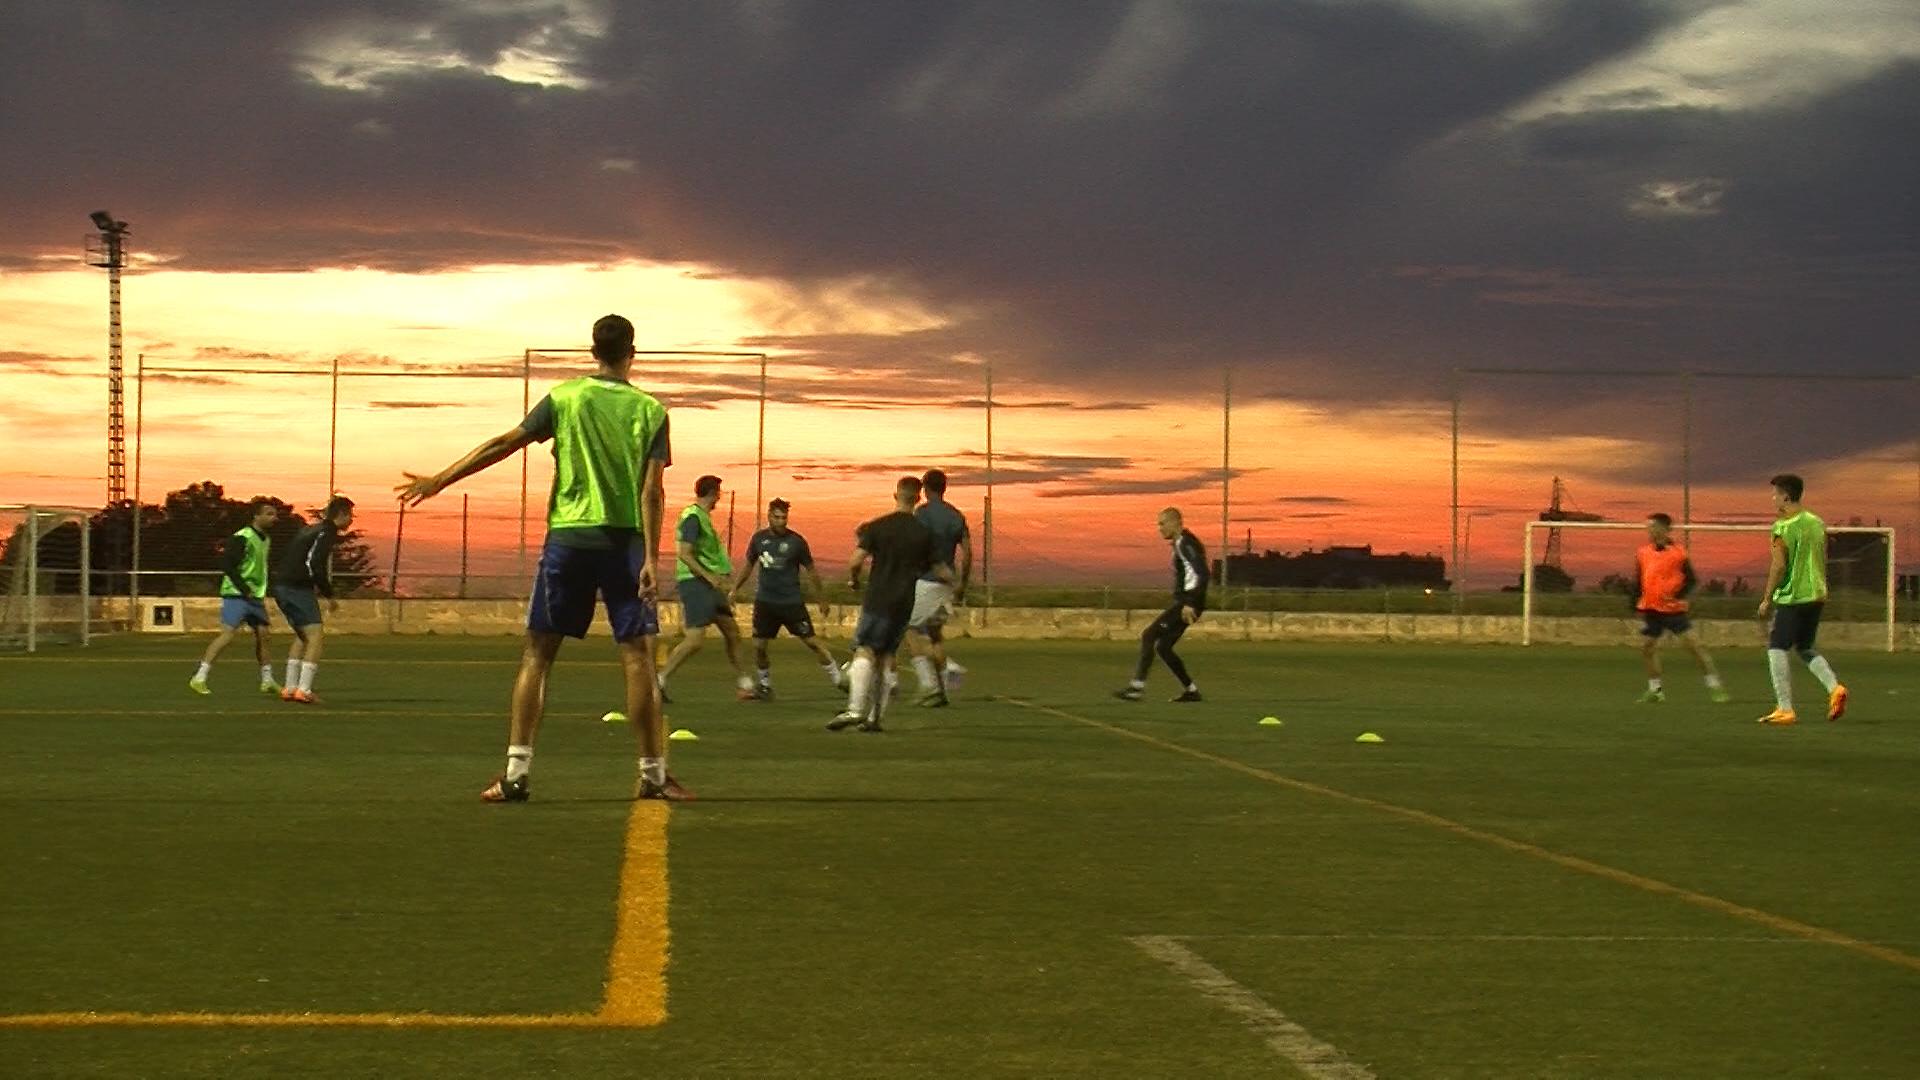 VÍDEO 6 Resum Temporada FCBorges.00_00_42_20.Imagen fija001